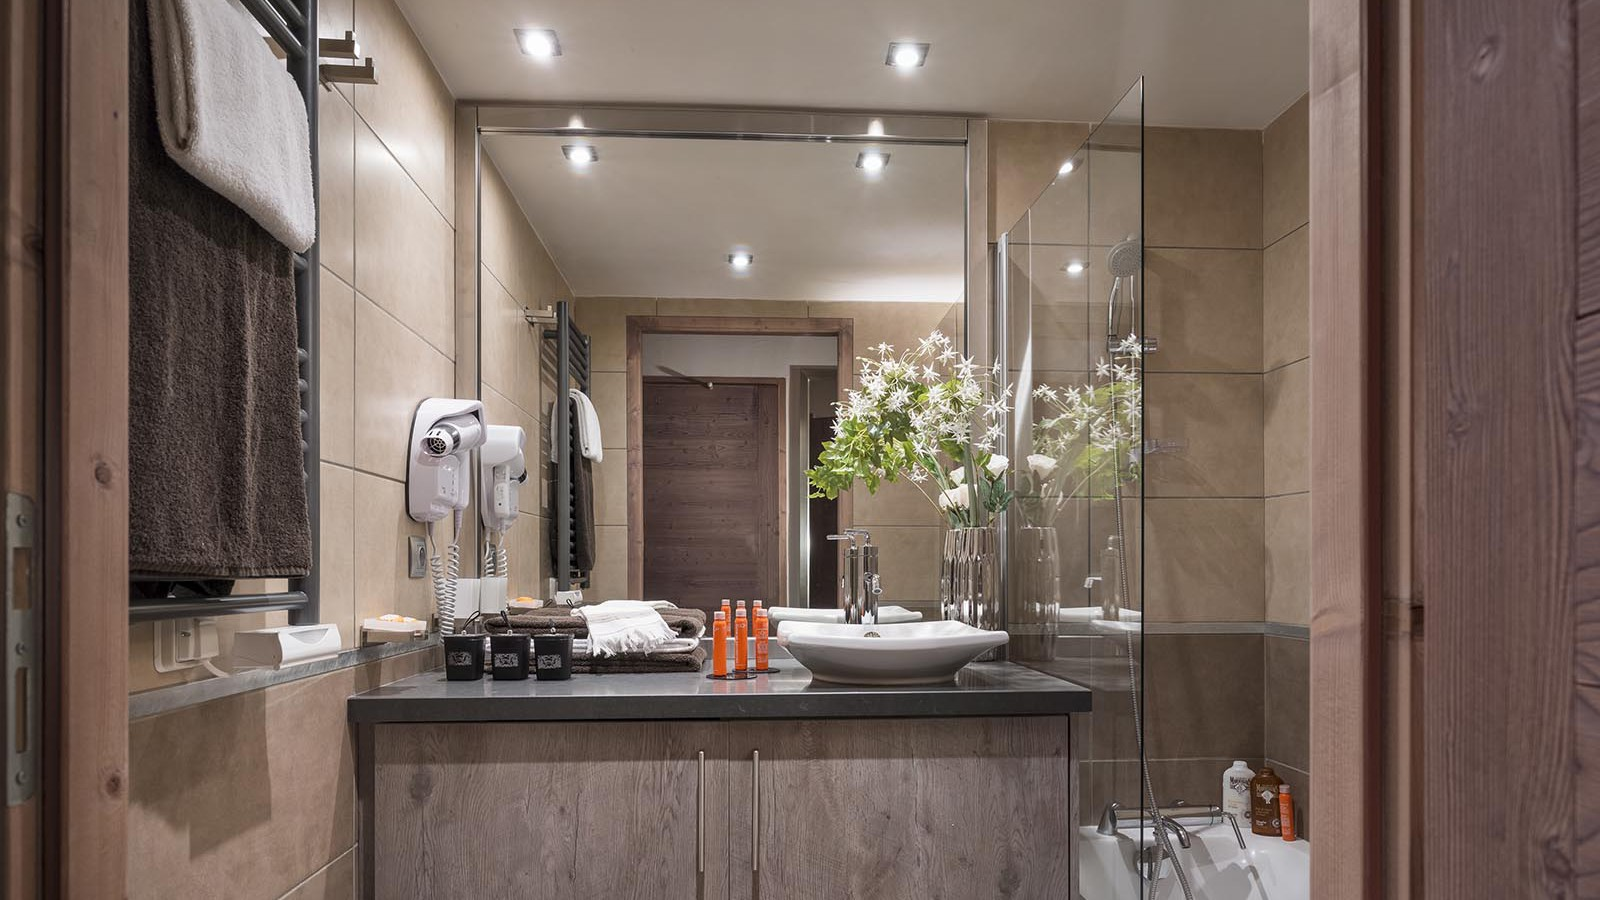 Bathrooms at CGH Le Centaure-apartment